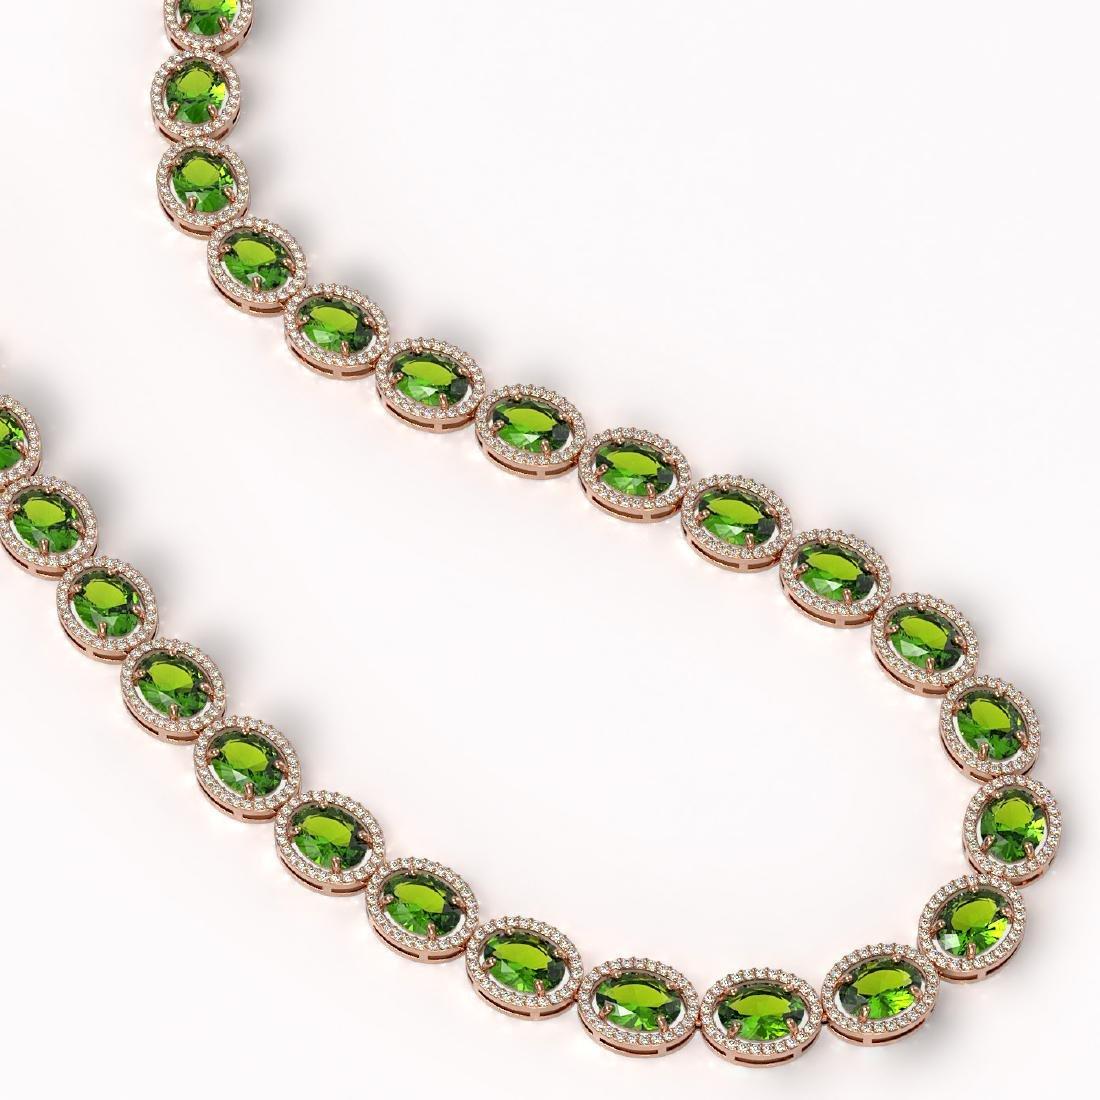 64.84 CTW Peridot & Diamond Halo Necklace 10K Rose Gold - 2